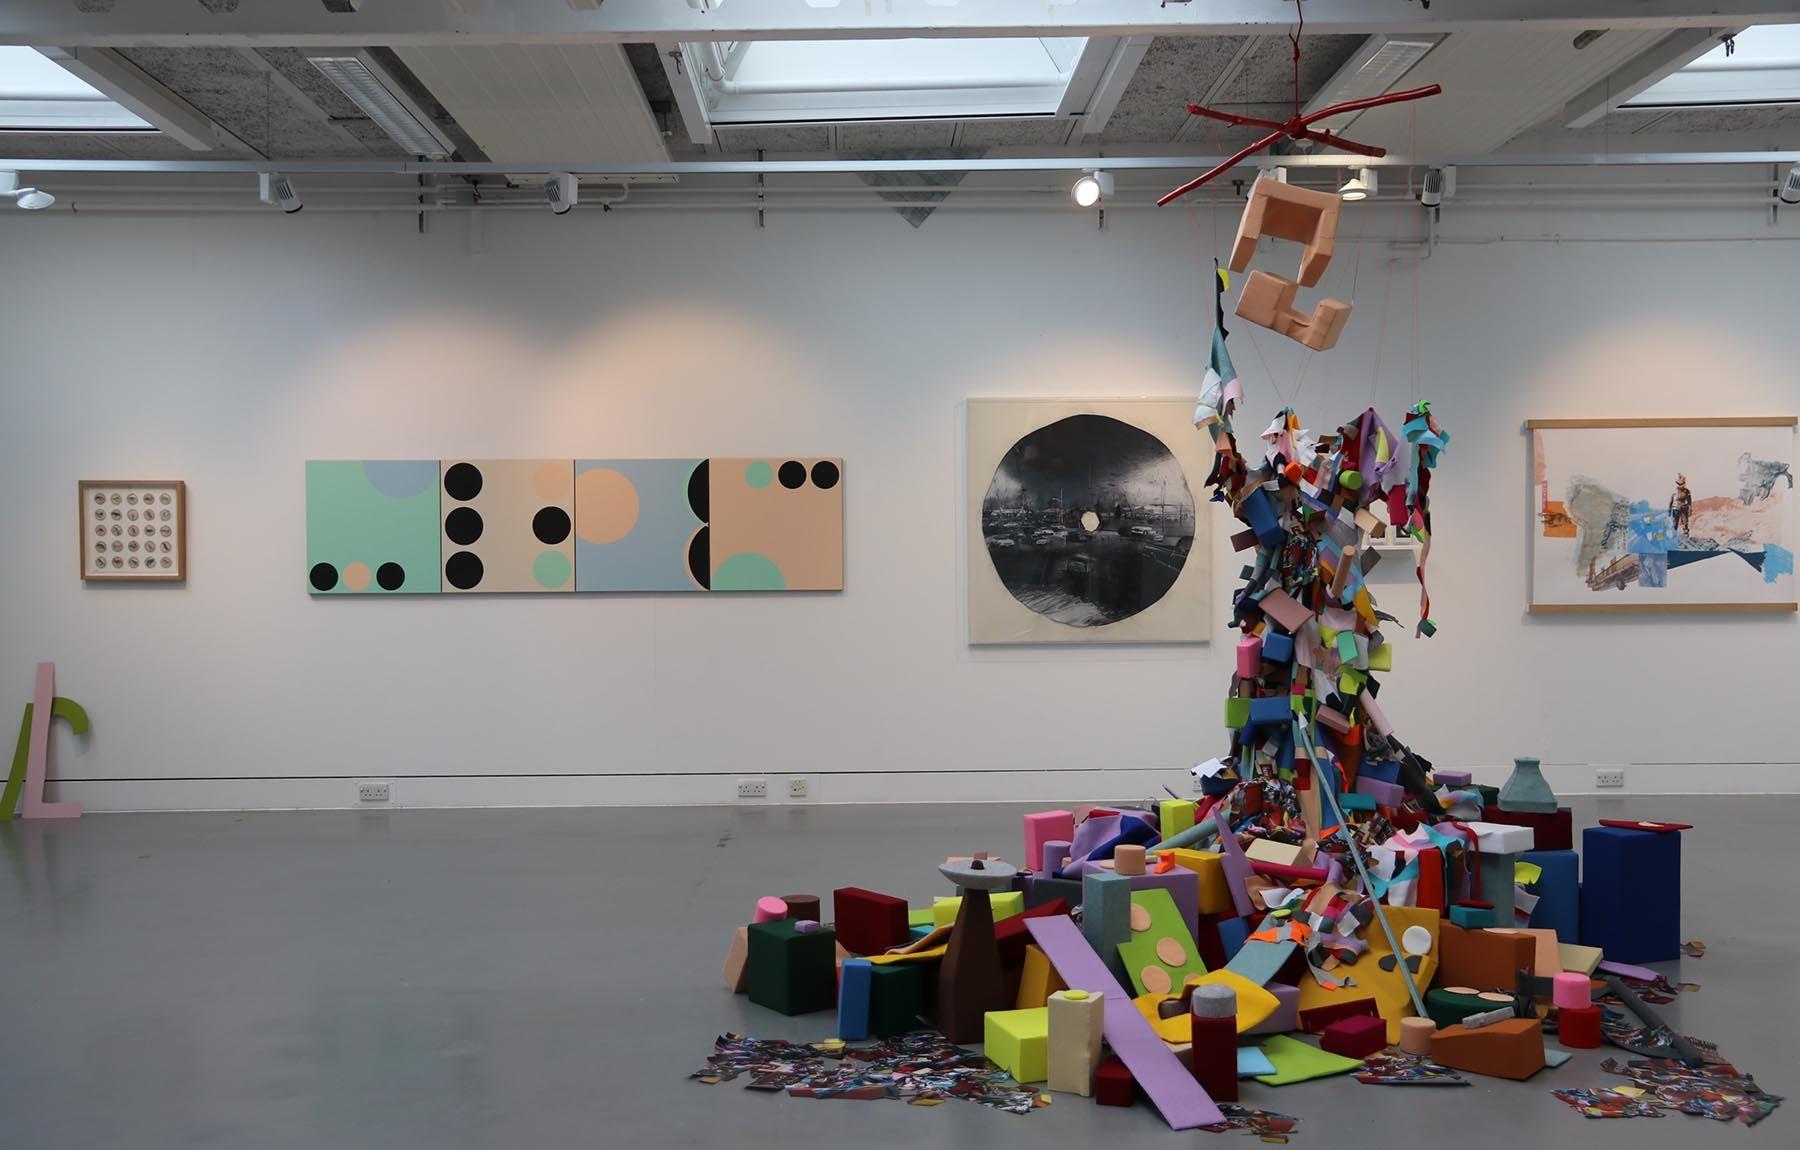 After Bauhaus, Herbert Read Gallery, UCA Canterbury